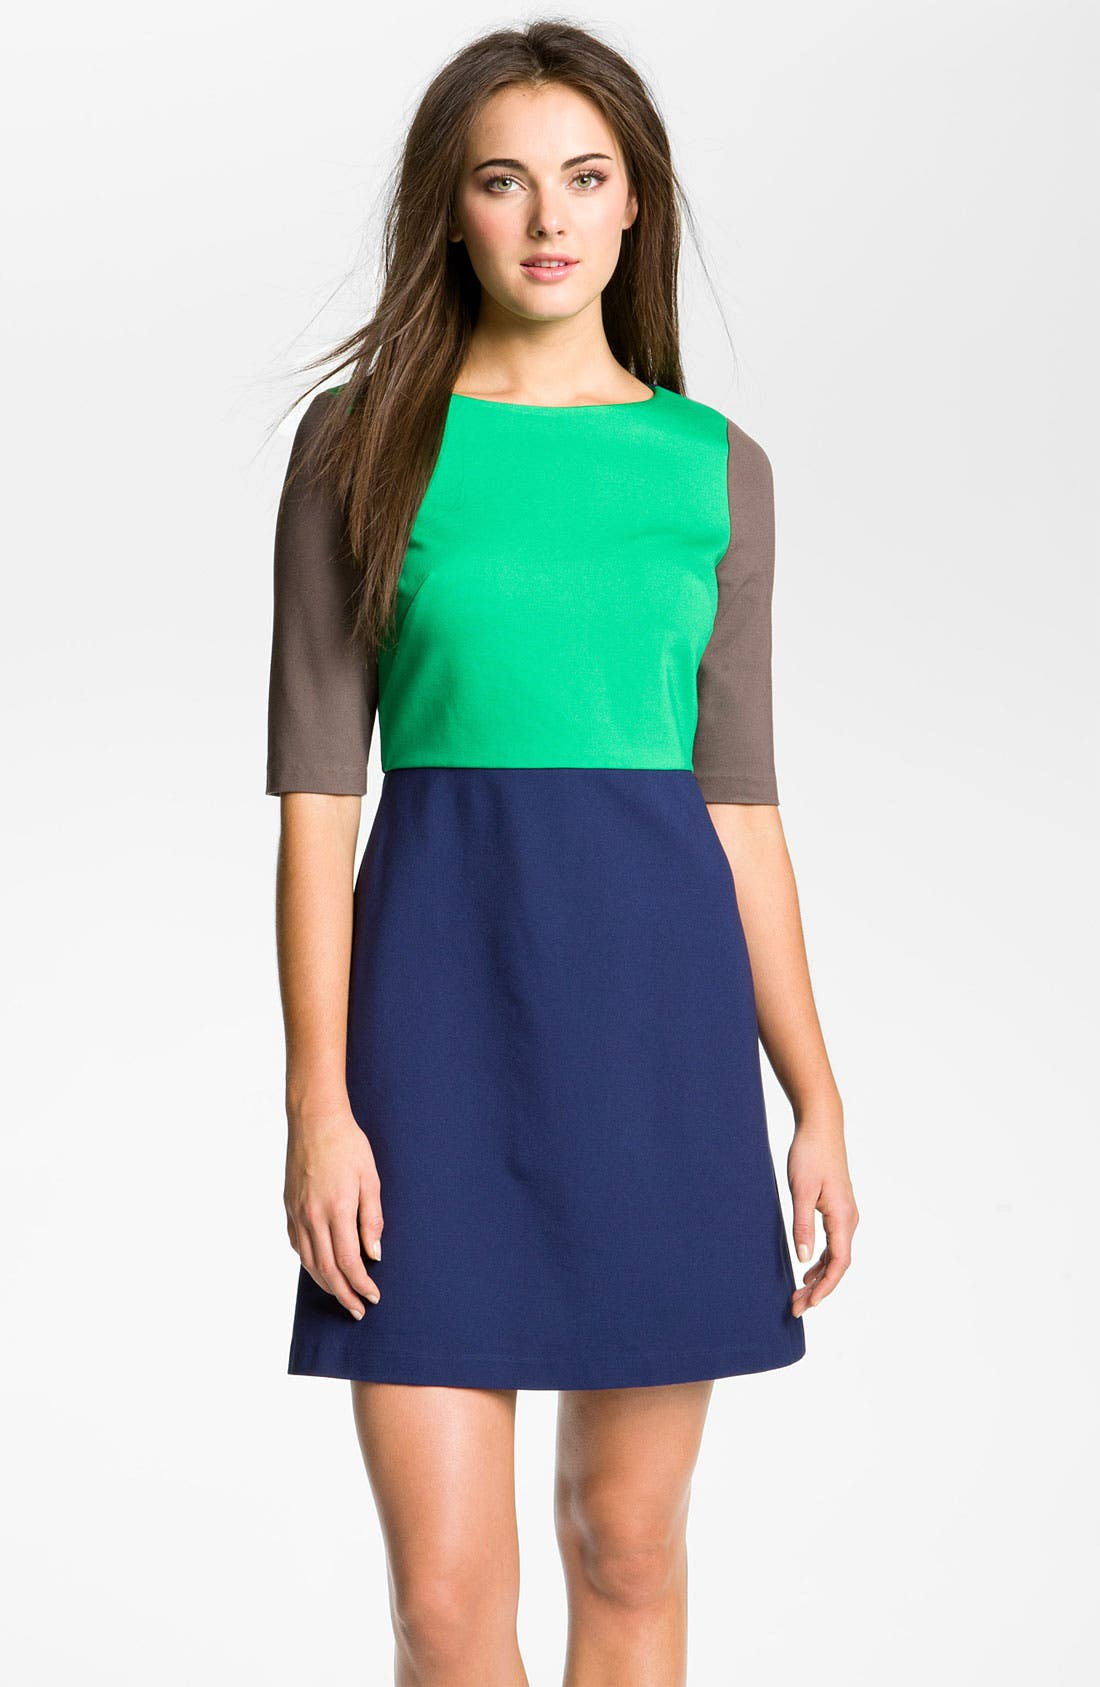 Main Image - Suzi Chin for Maggy Boutique Colorblock Ponte Dress